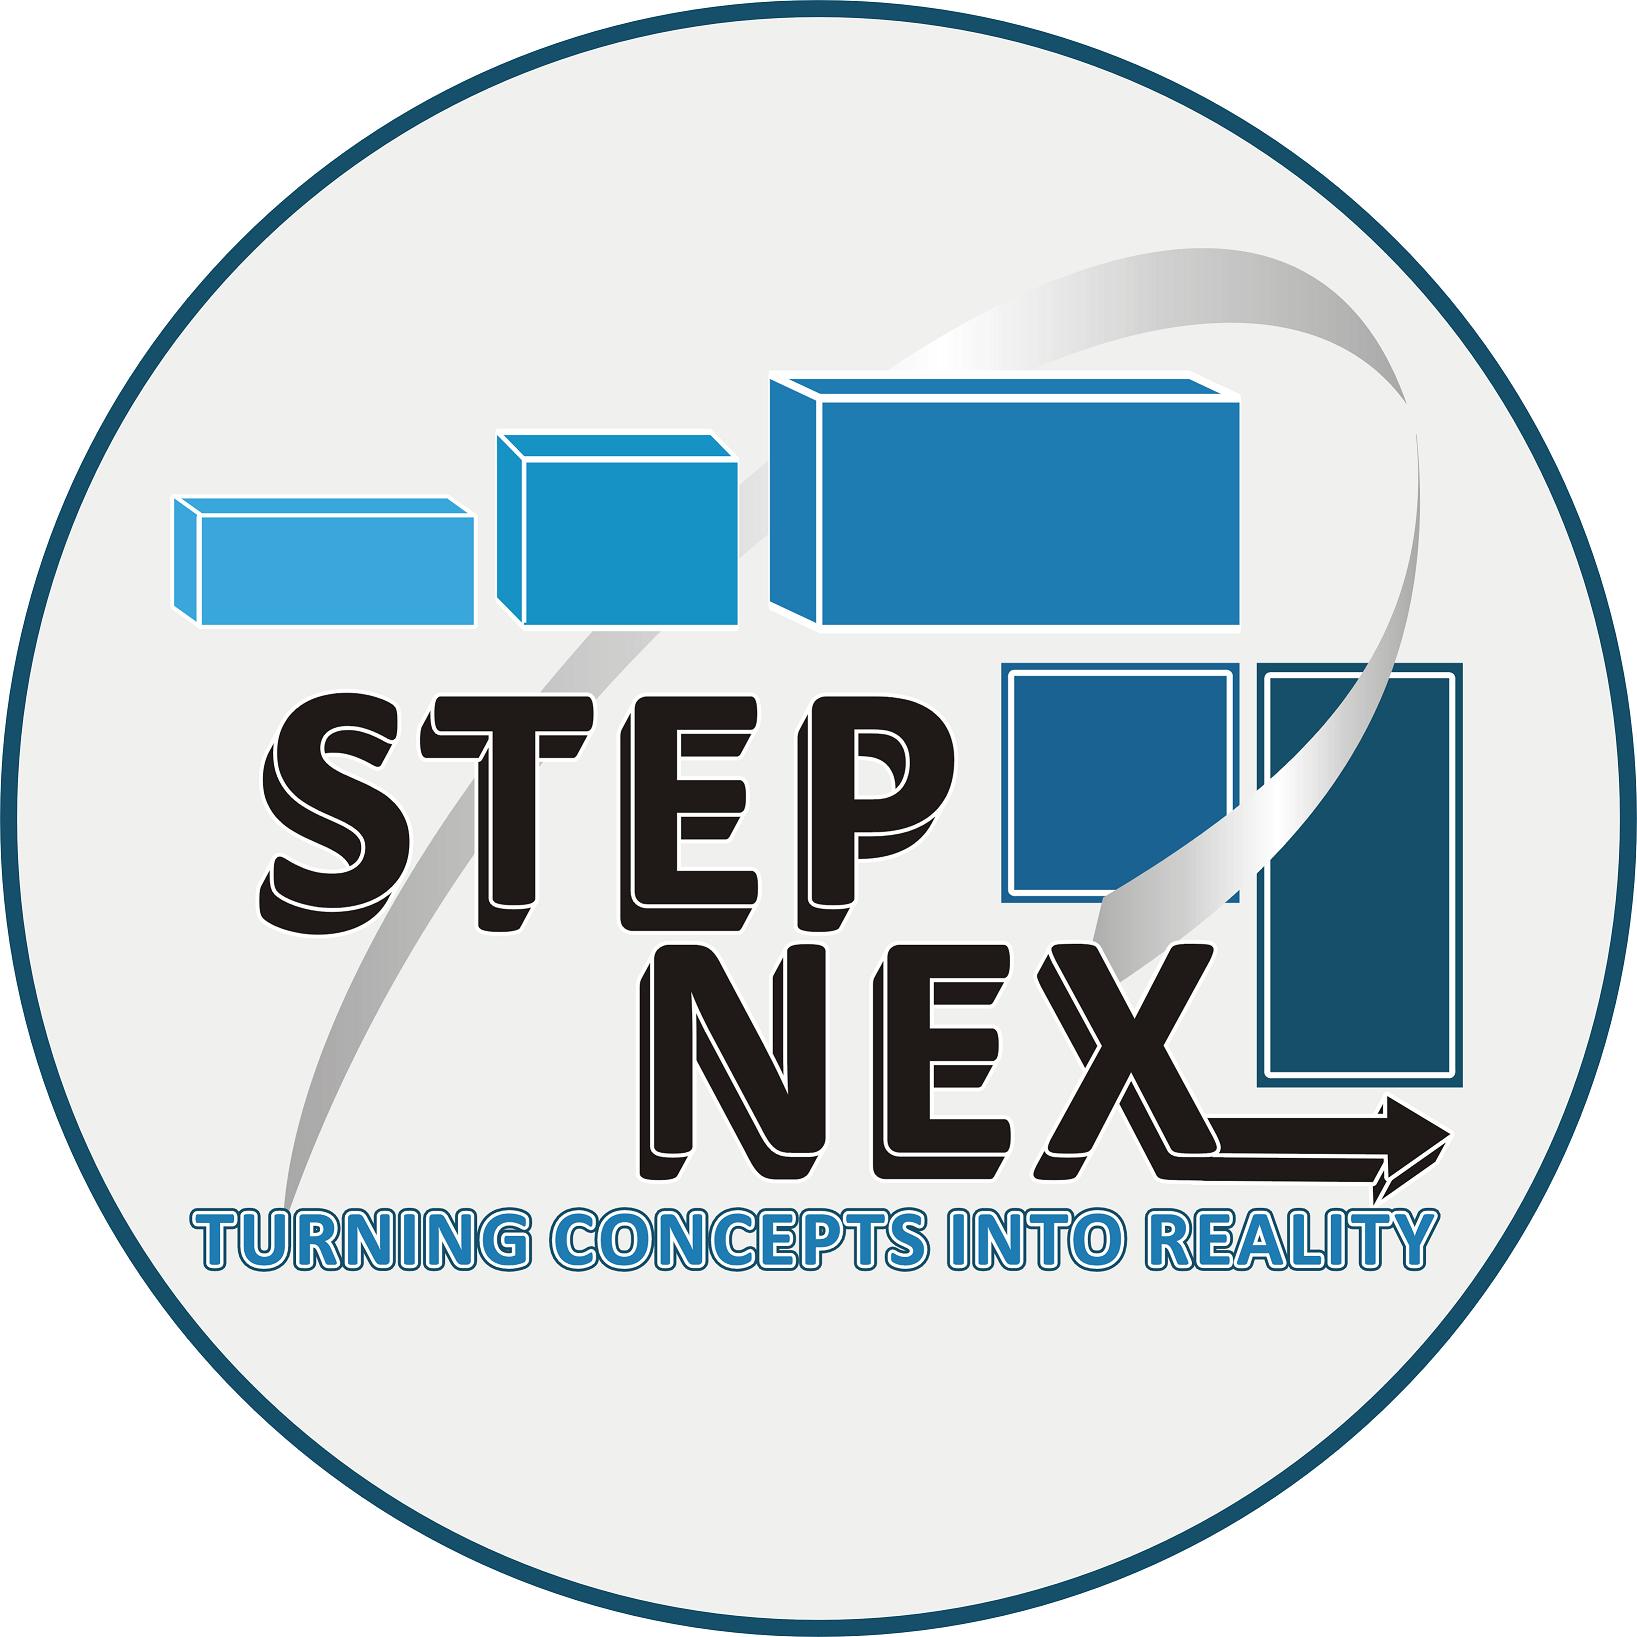 Stepnexs logo